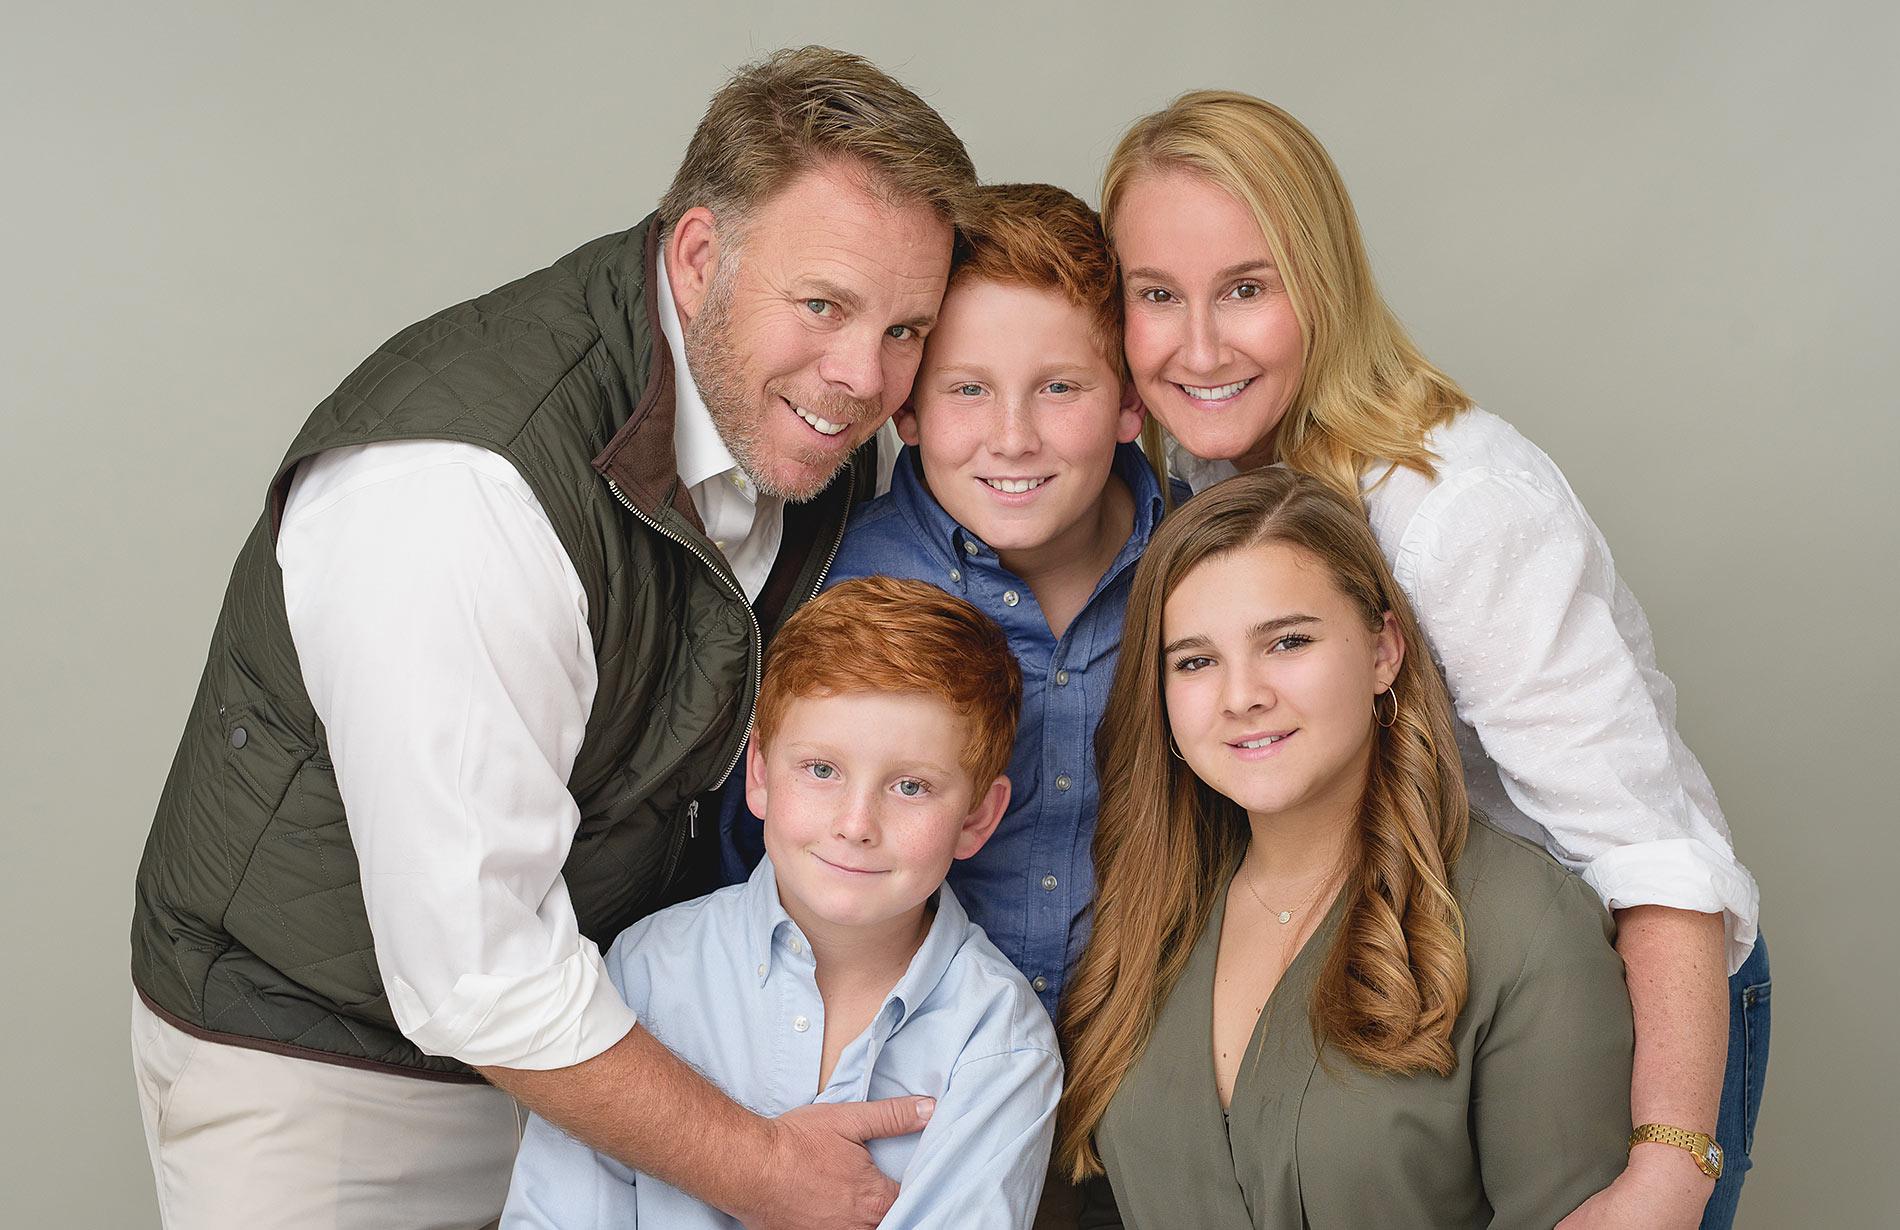 greenwich-ct-photographer-family-portraits.jpg